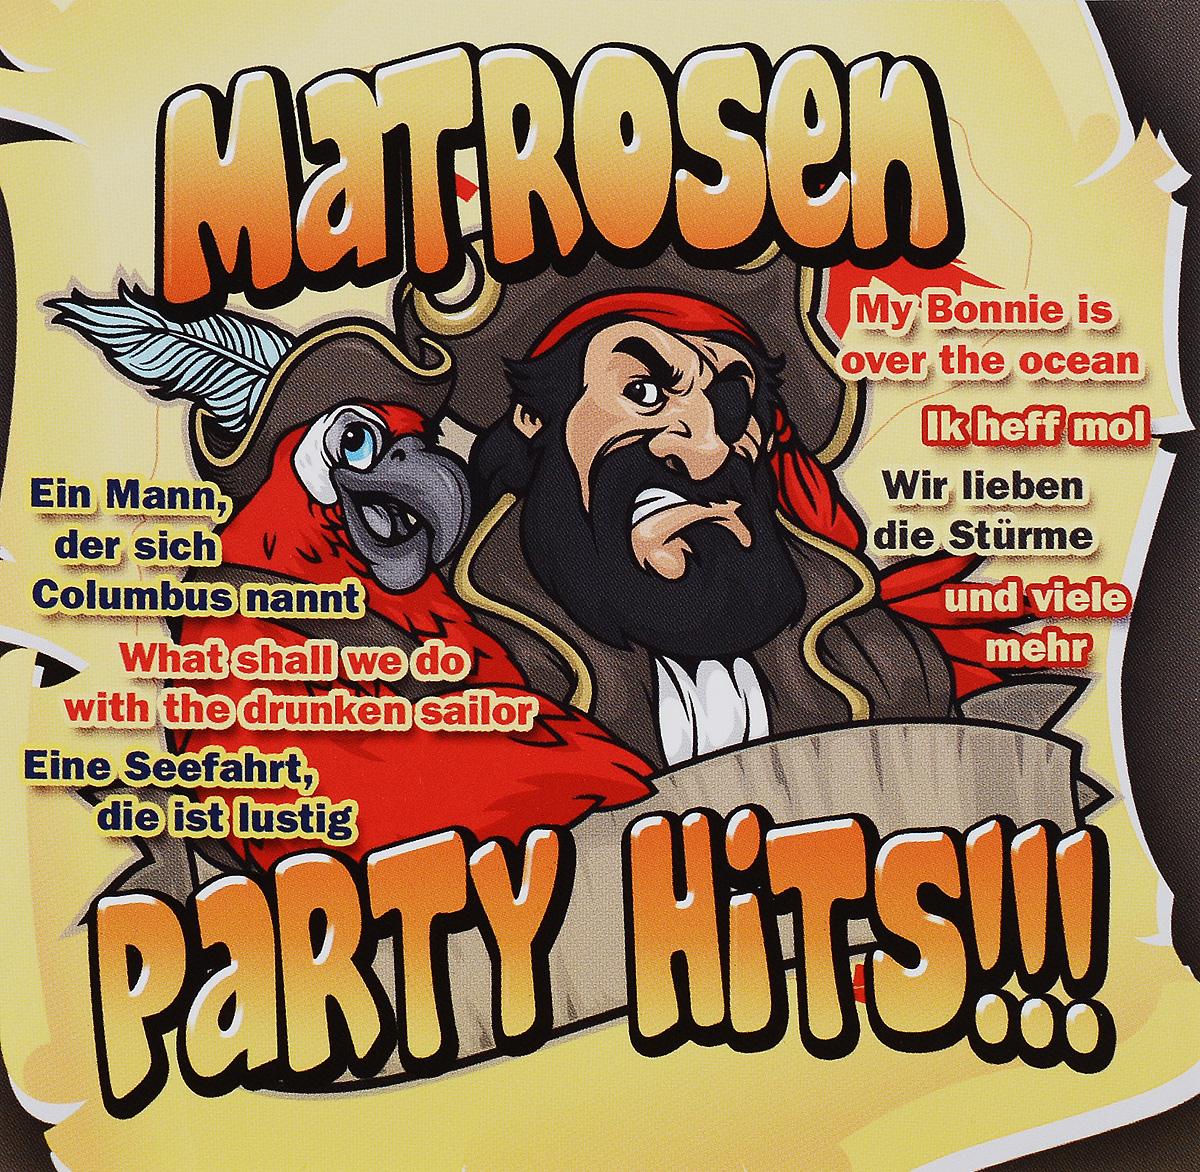 Matrosen Party Hits!!! christmas party hits